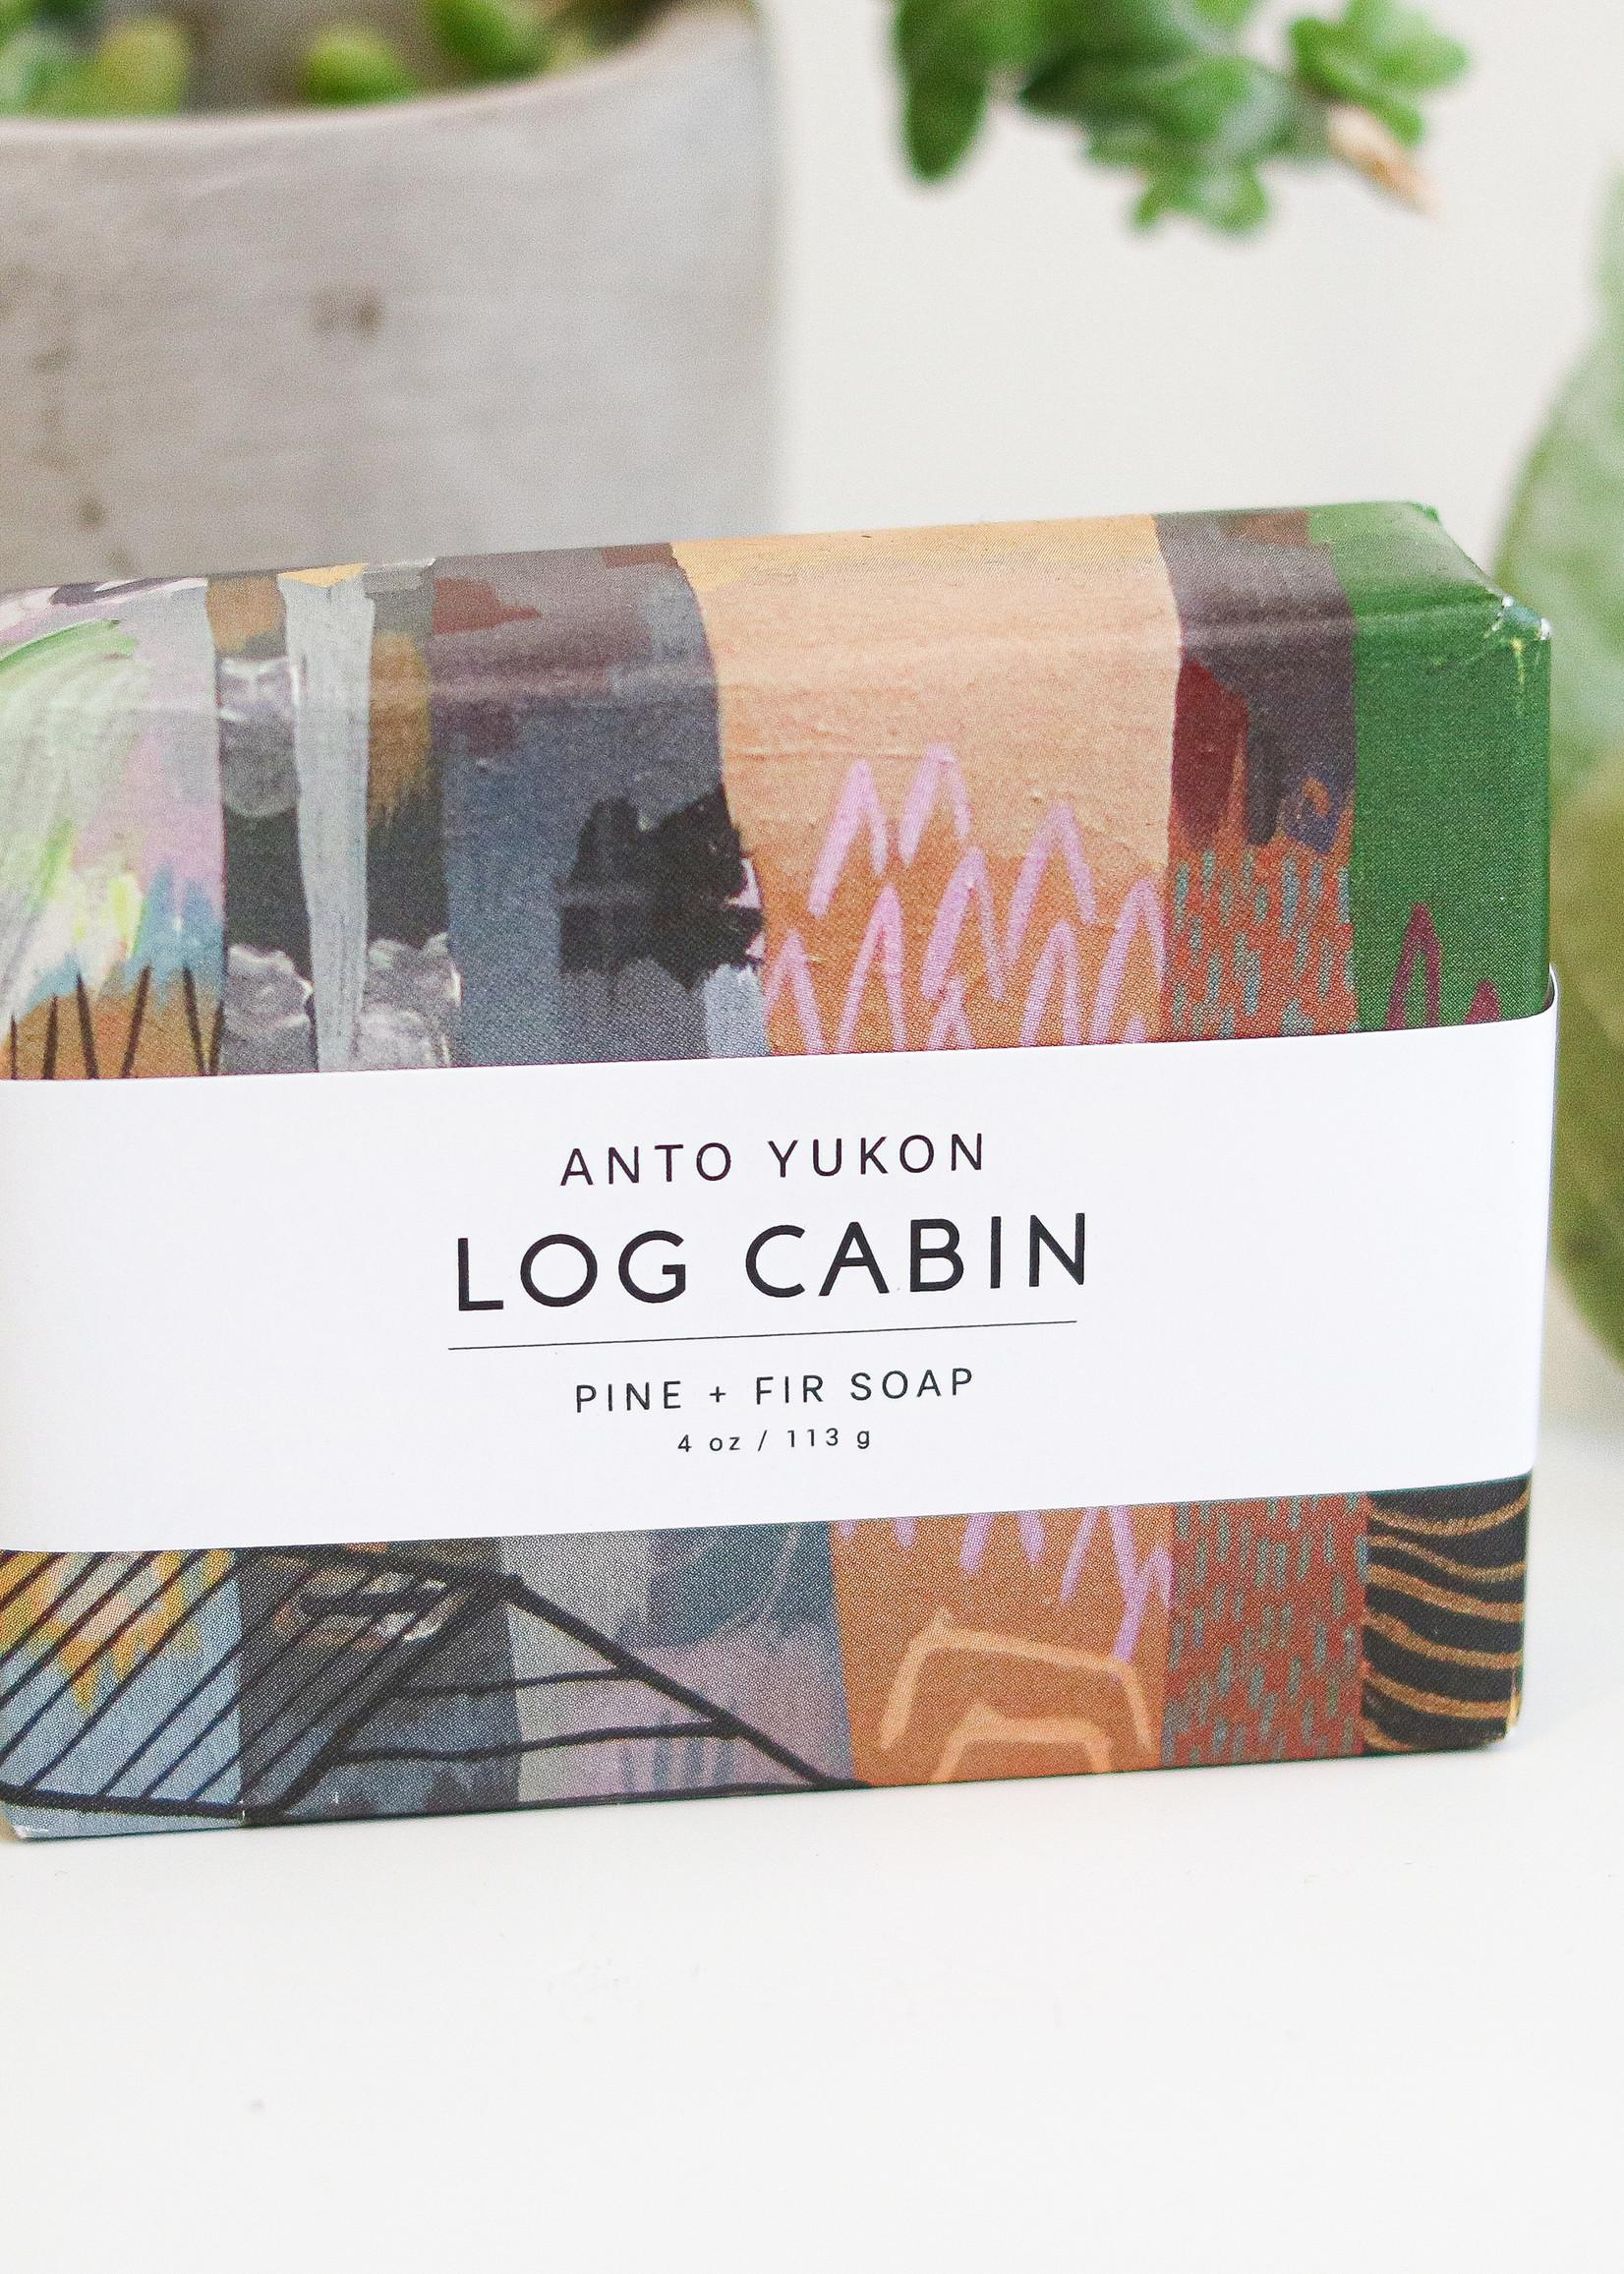 Anto Yukon Anto Yukon - Log Cabin Soap